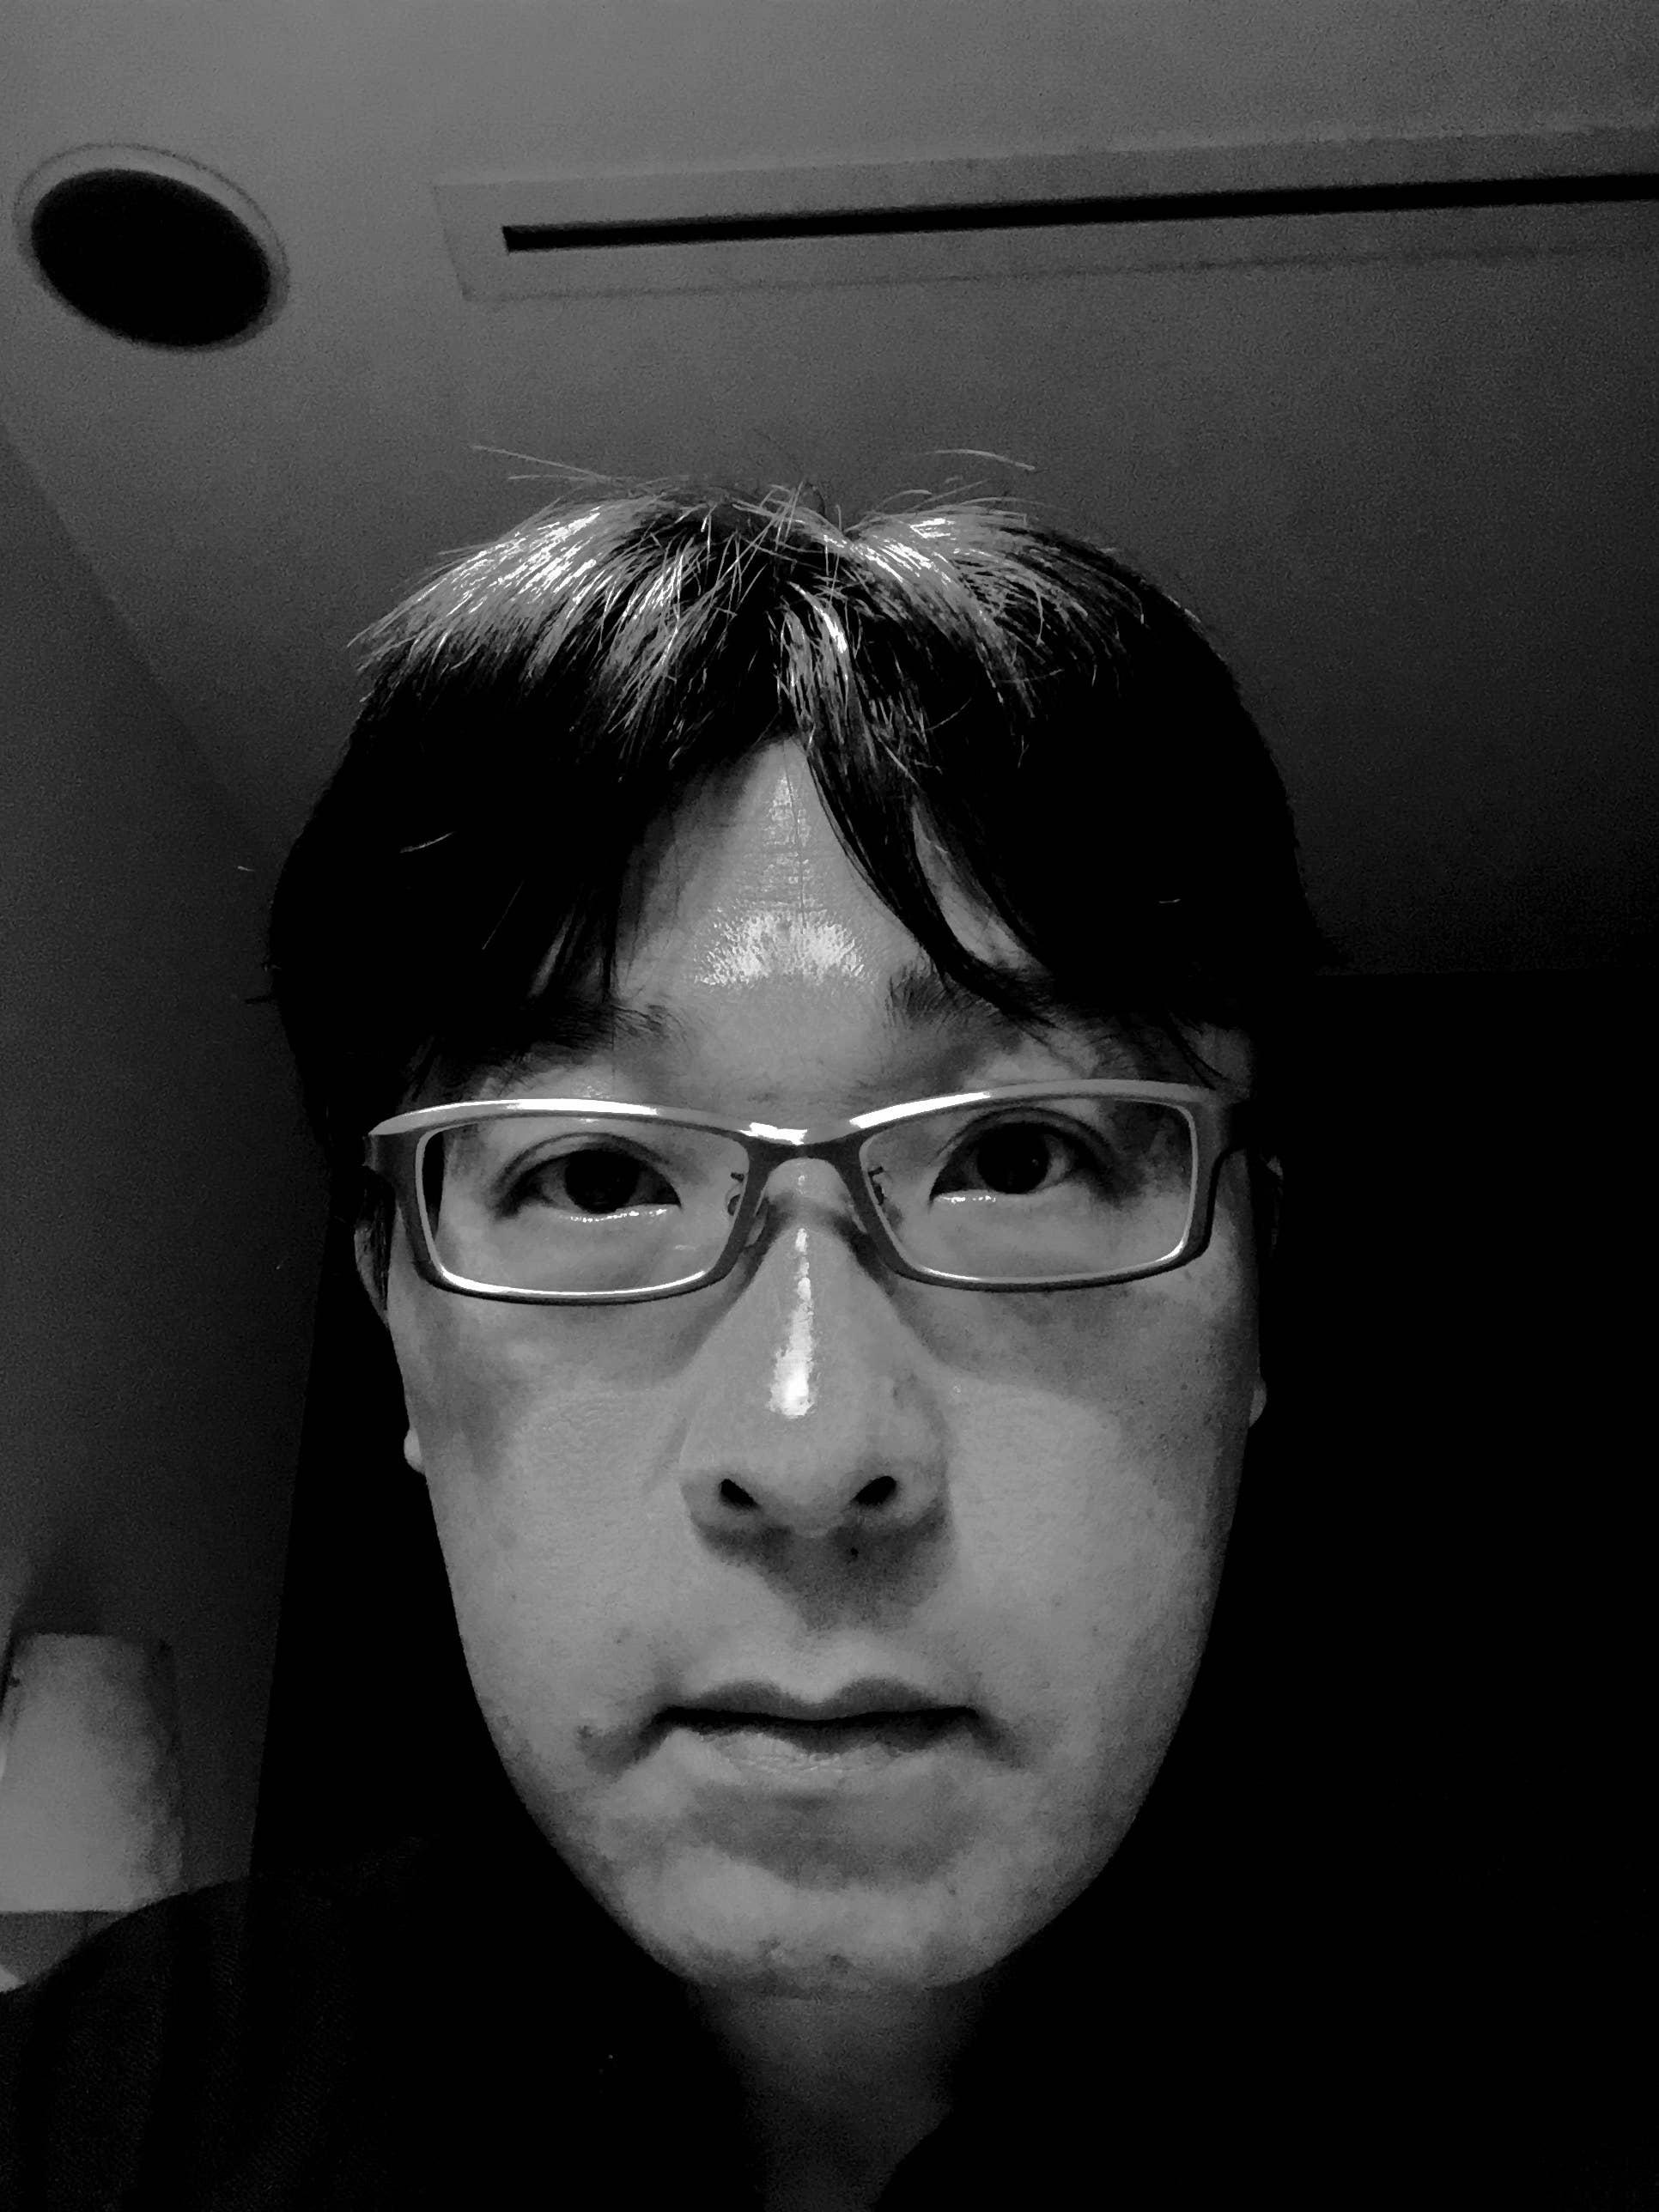 Yutaka Nozaki